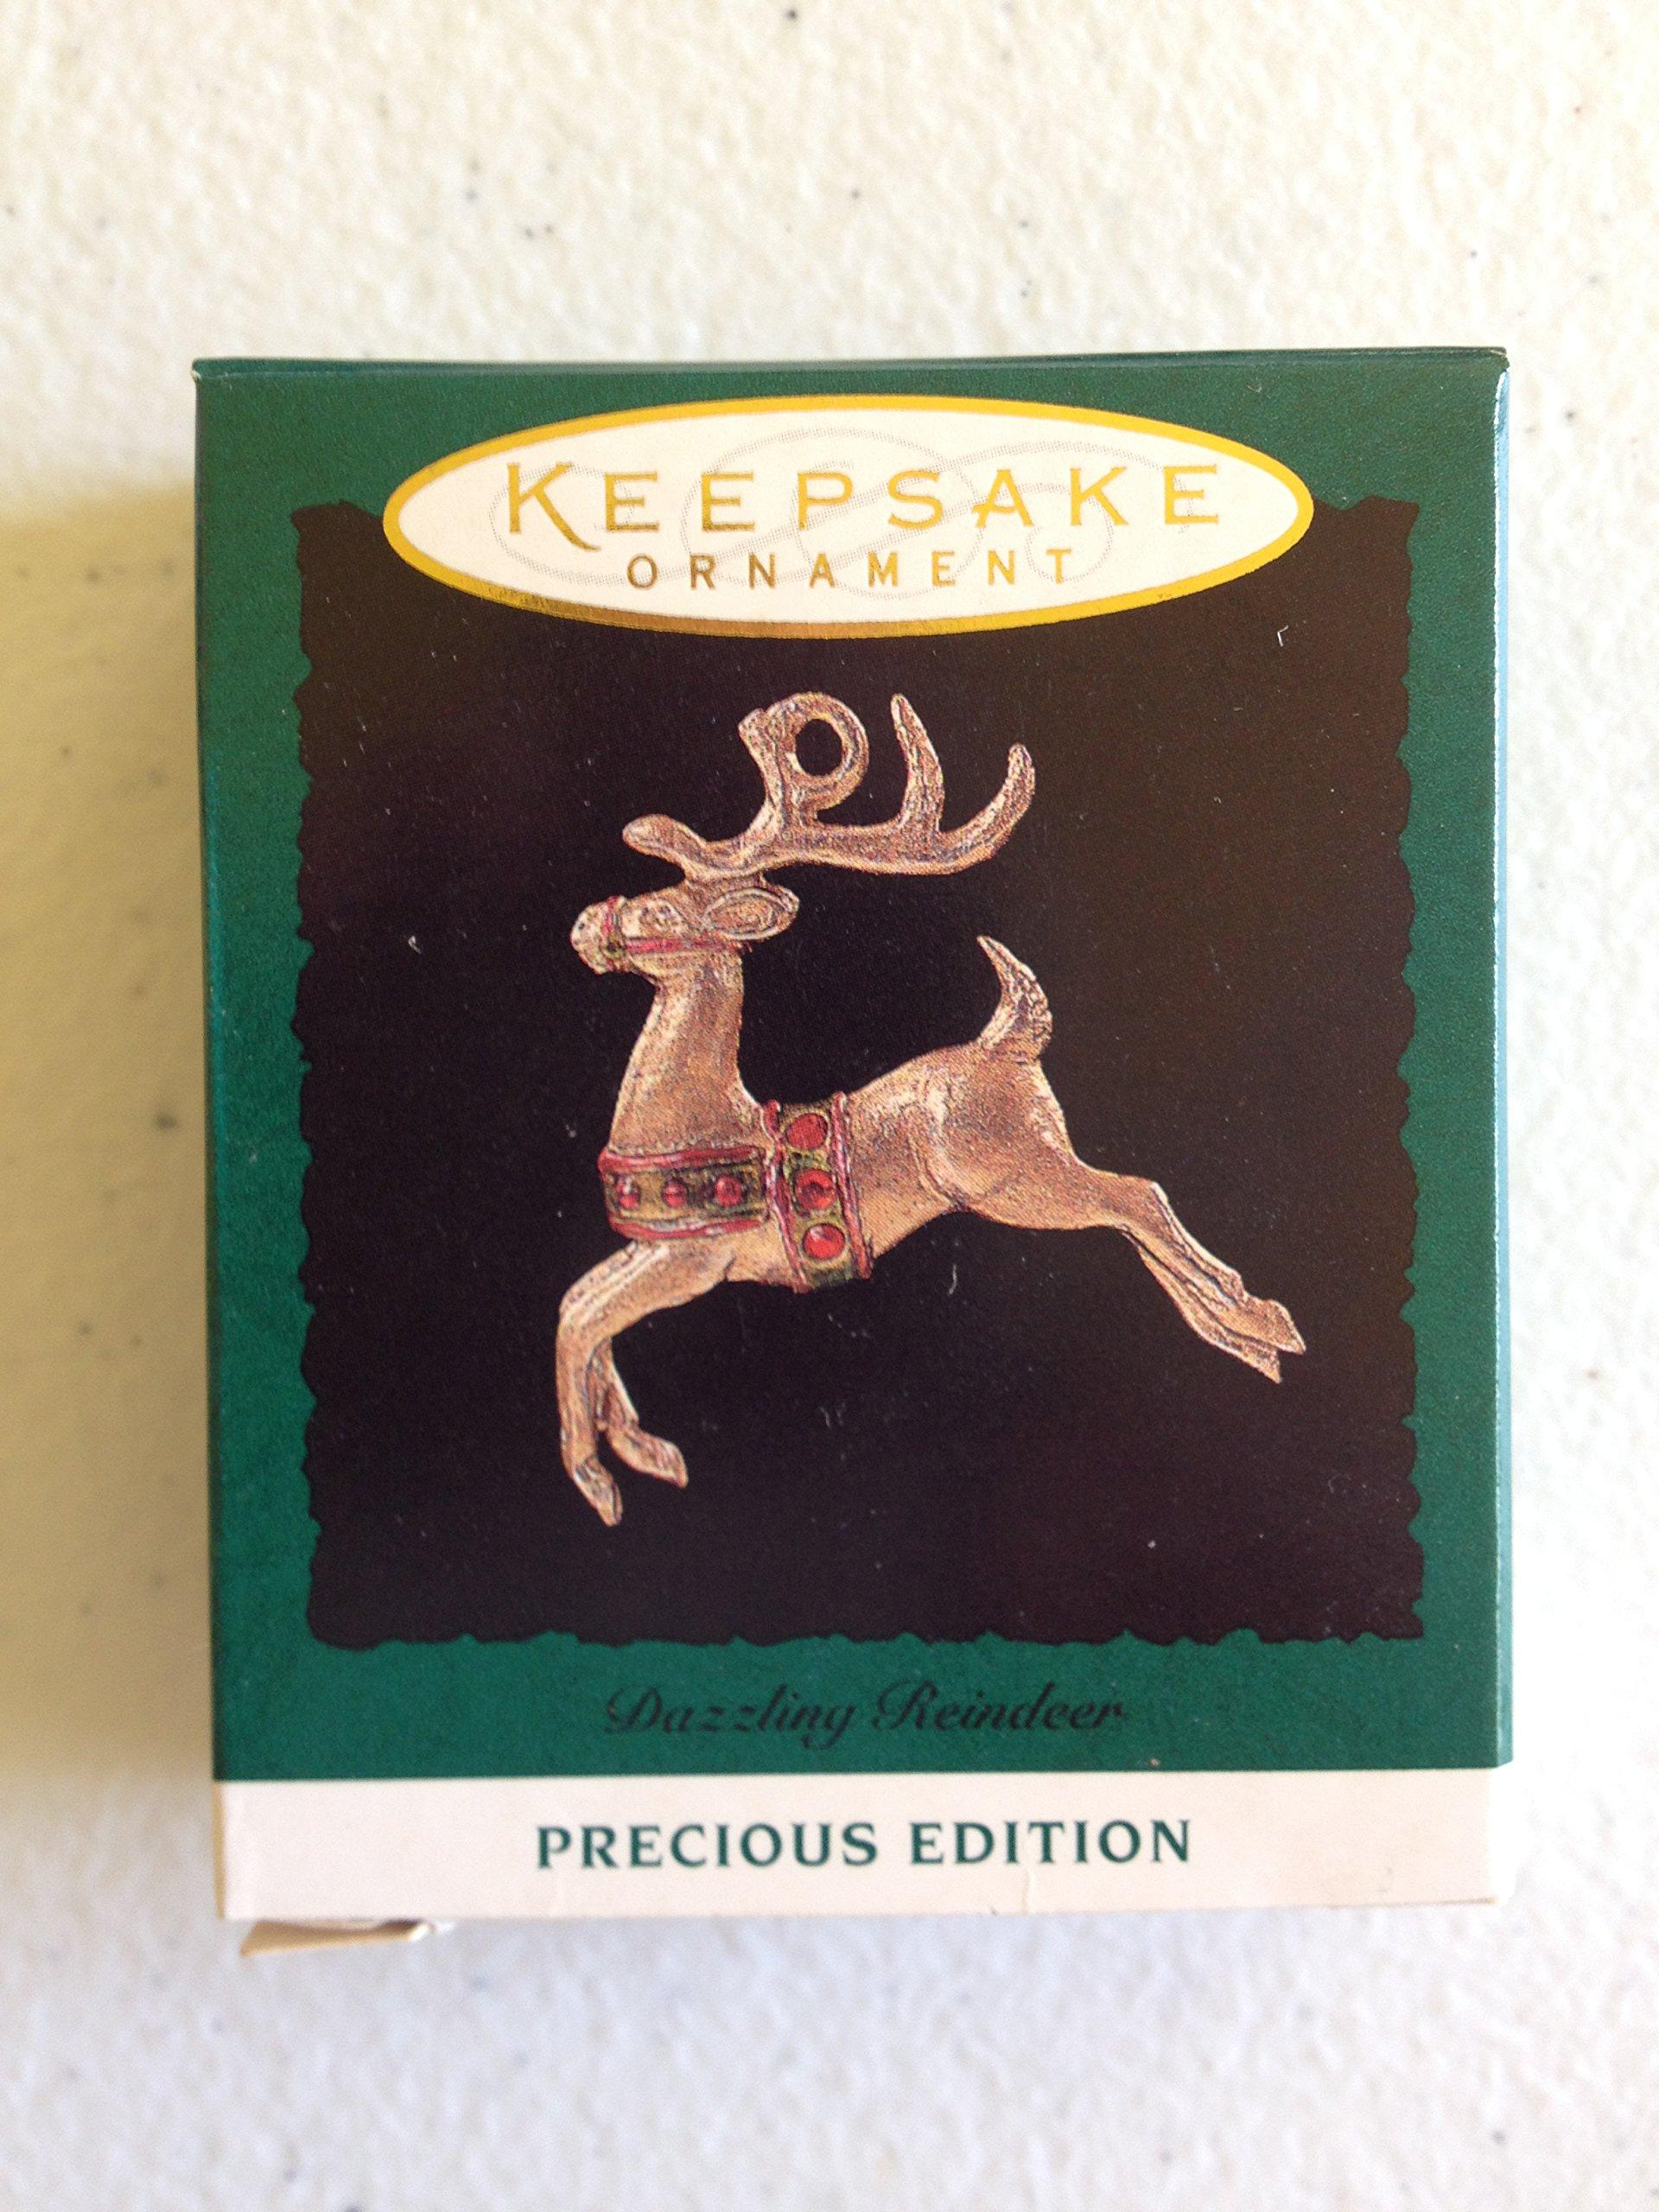 Hallmark Keepsake Ornament ''Dazzling Reindeer'' 1994 Precious Edition (QXM402-6)